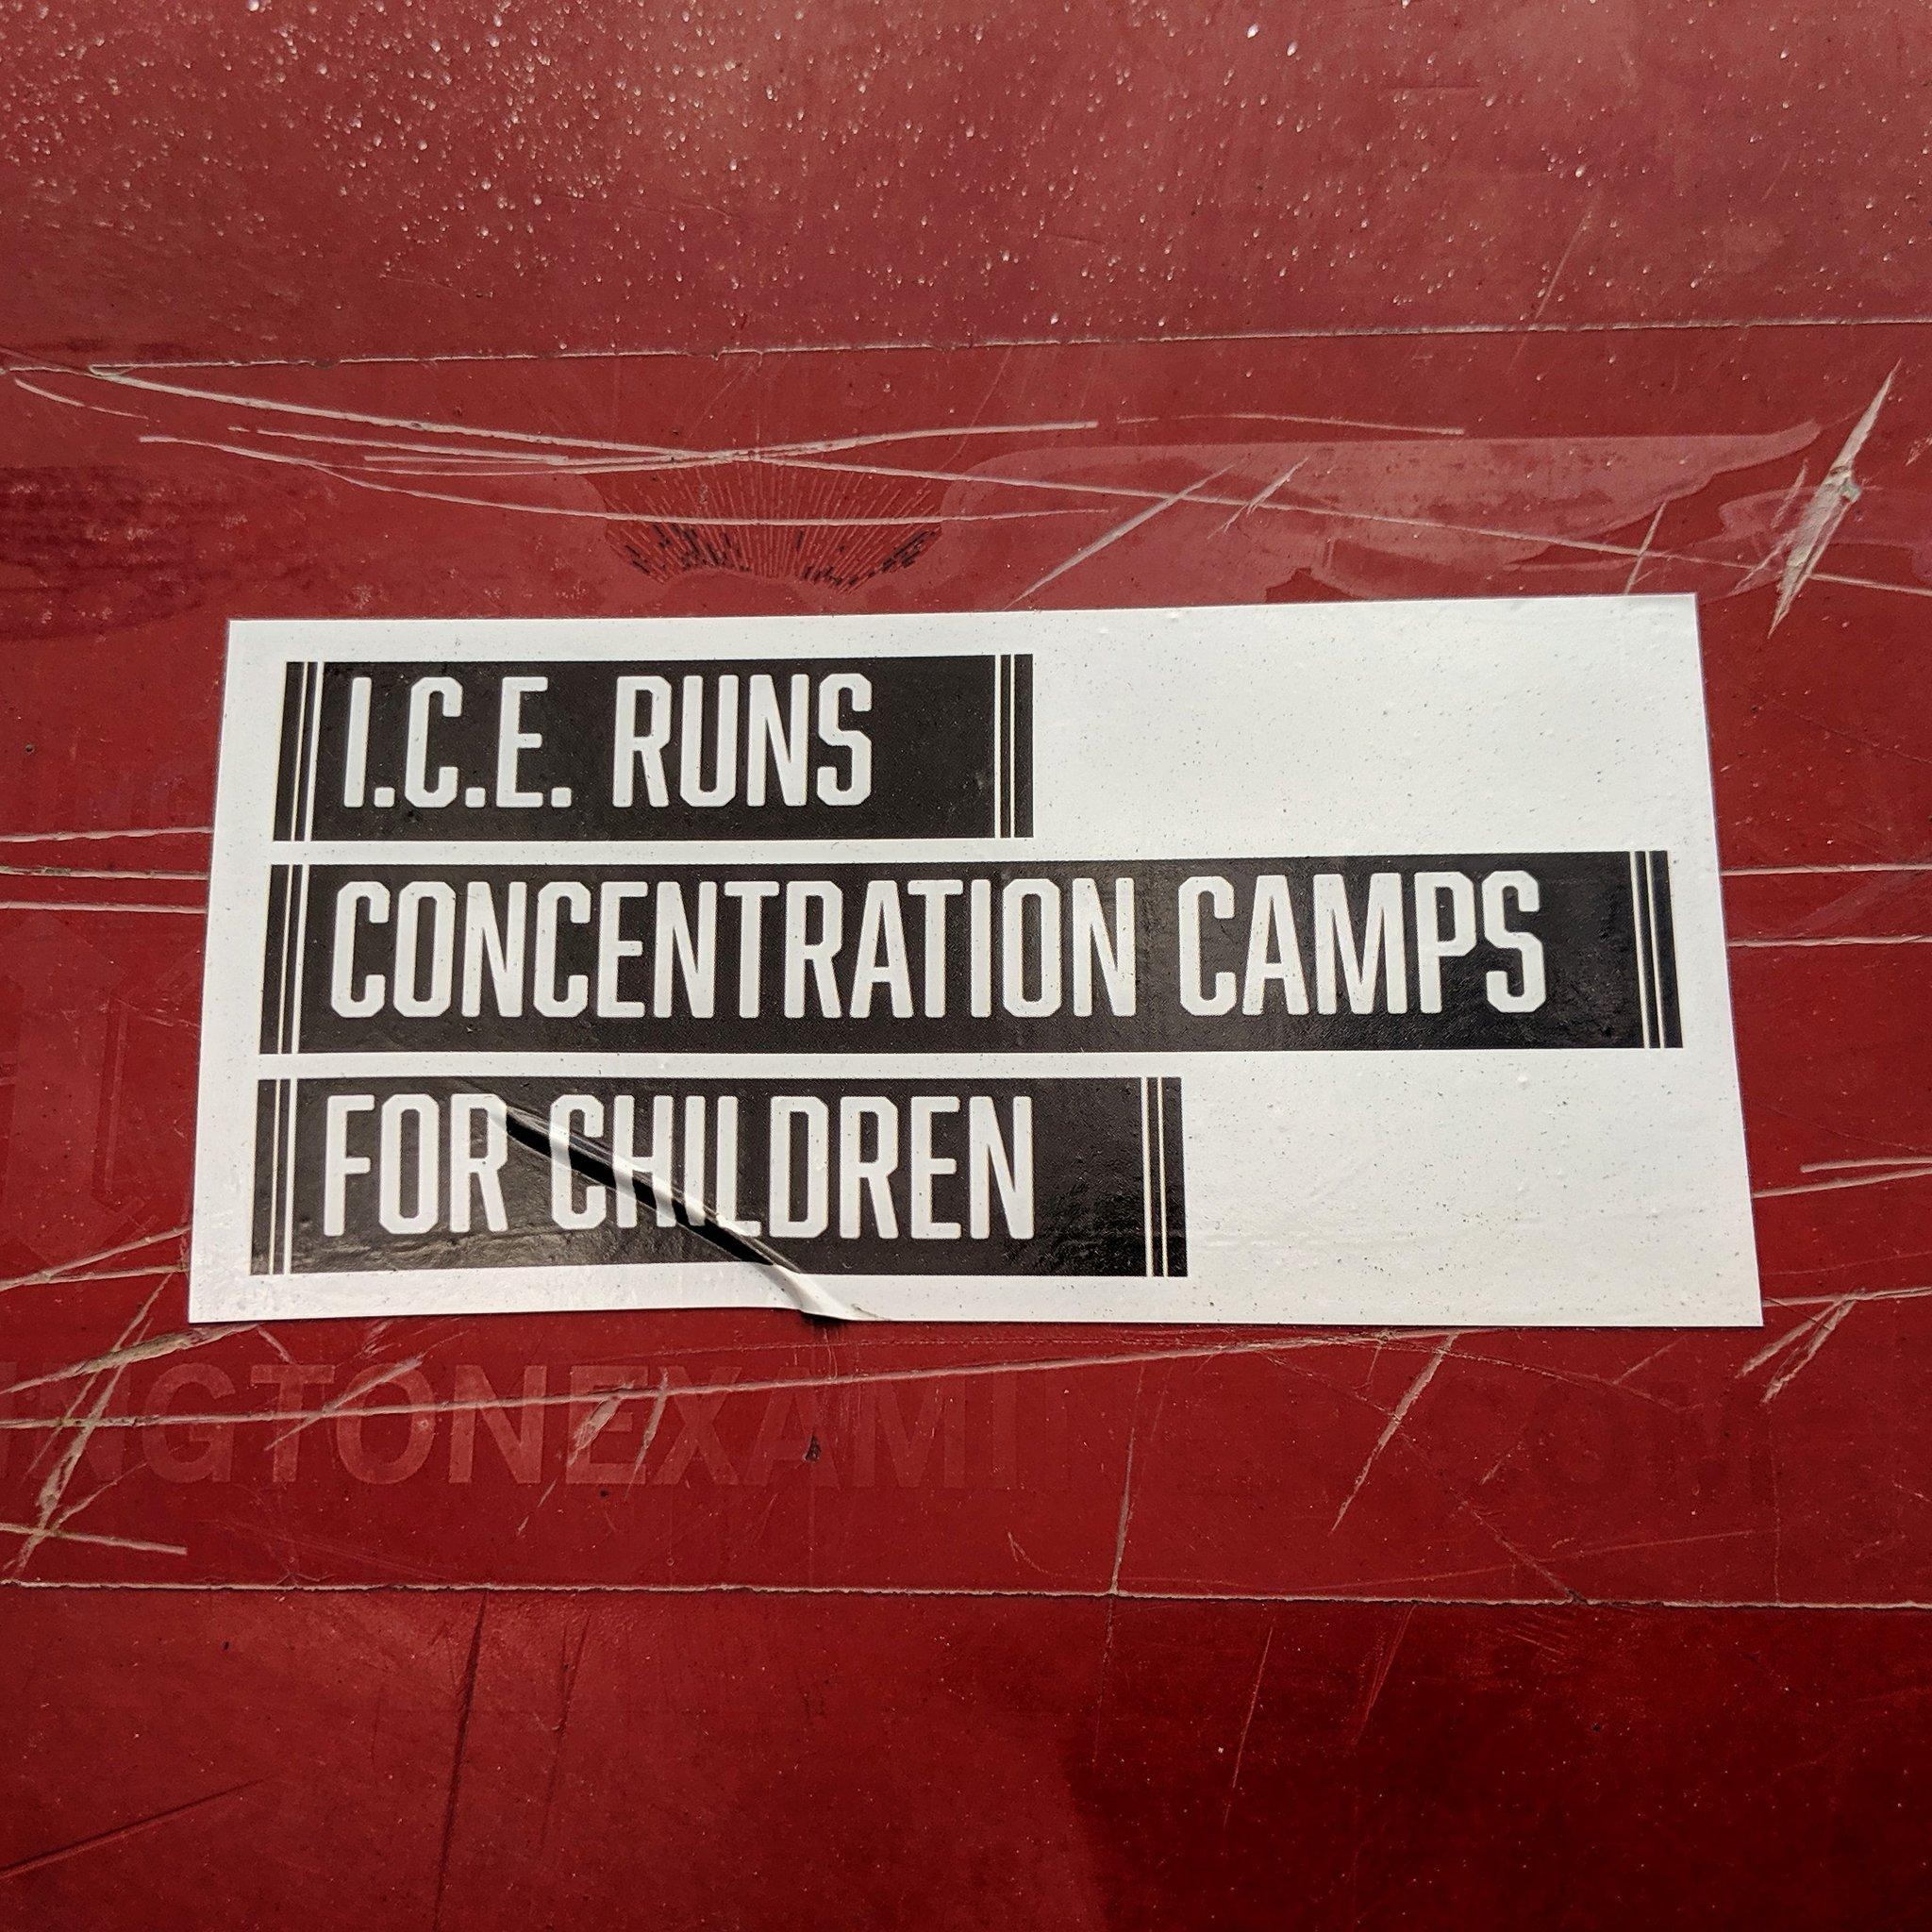 """I.C.E. runs concentration camps for children"" #immigration #ice #immigrants #immigrantsmakeamericagreat #immigrantrights #immigrantchildren #resist #Trump #protest #streetart #DC #WashingtonDC #theresistance #streetartdc #resistance #art #artivism #politicalart #politics https://t.co/83vM76ckNP"